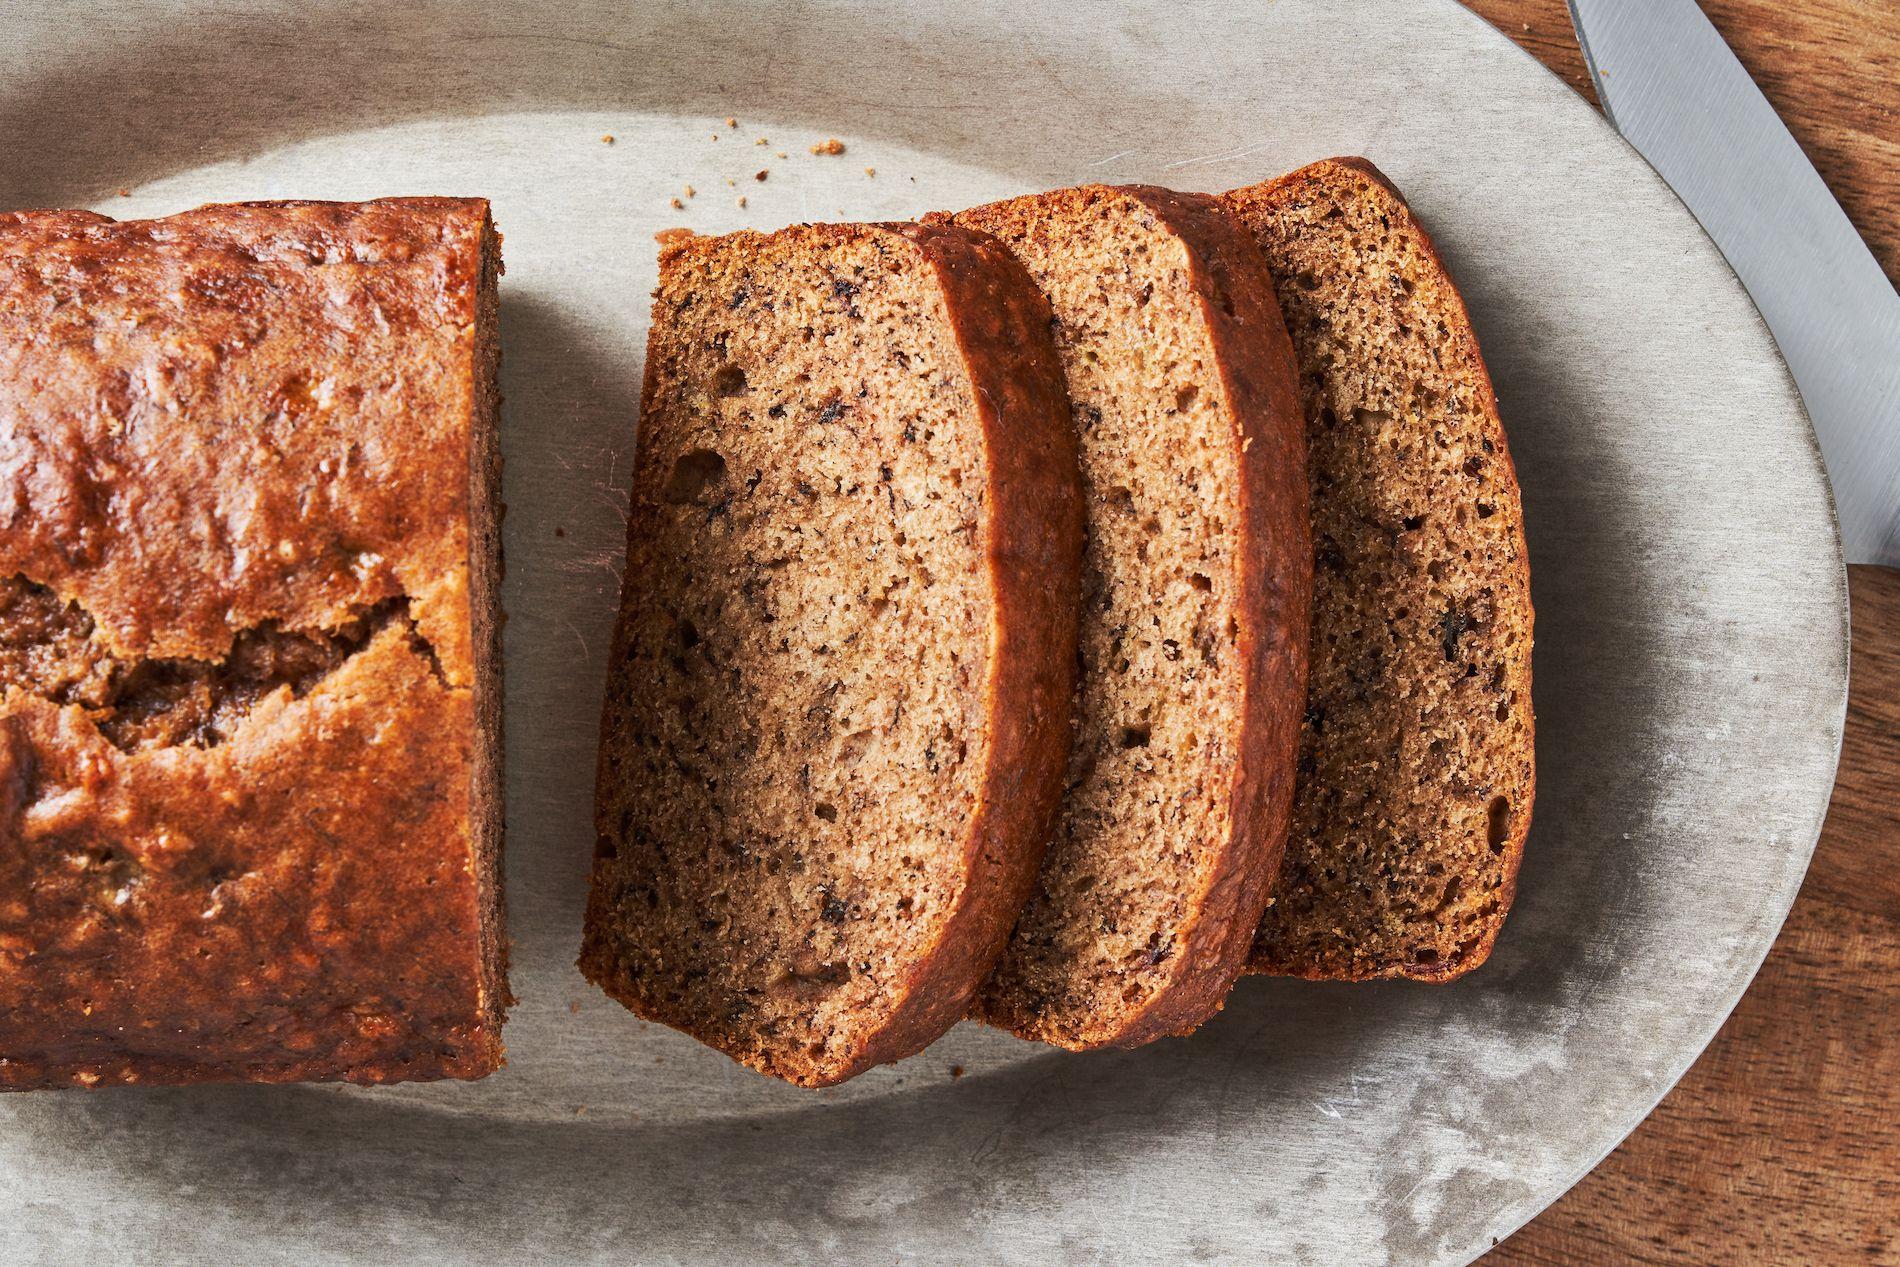 Best Vegan Banana Bread Recipe How To Make Vegan Banana Bread